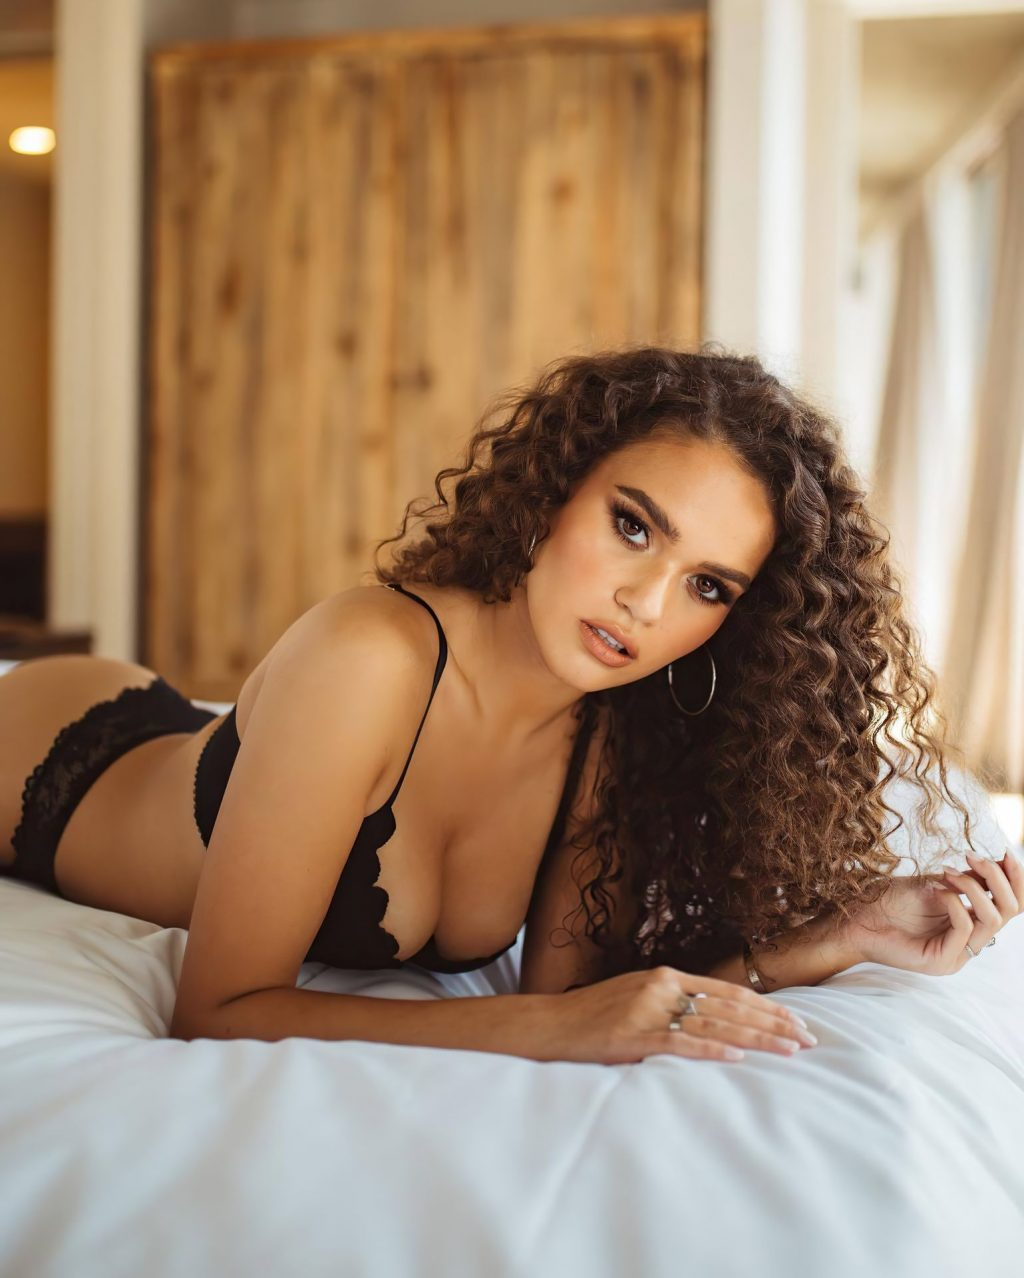 Madison Pettis Displays Her Sexy Body (9 Photos + Video)